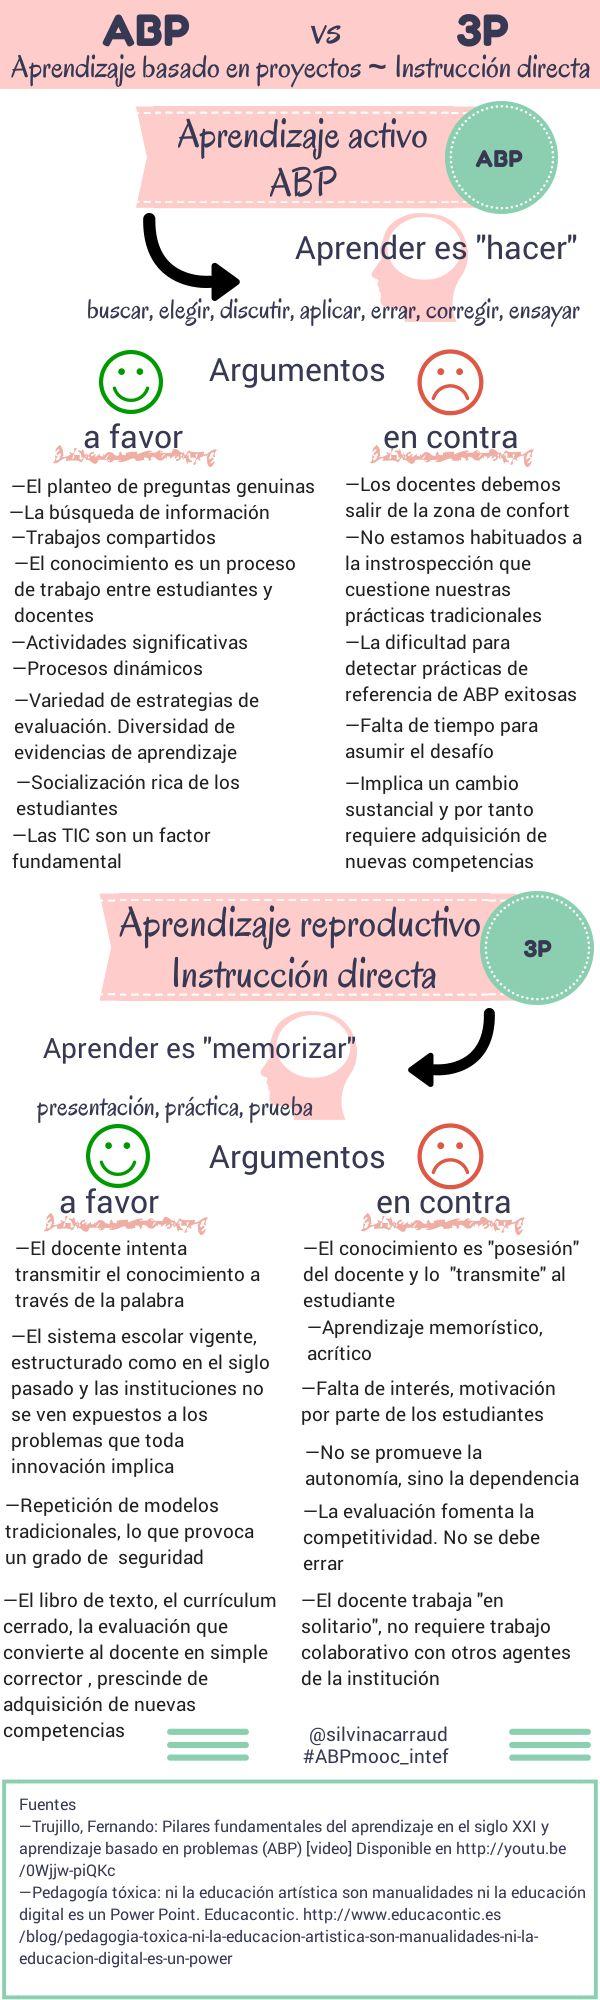 Aprendizaje activo vs Aprendizaje reproductivo #infografia